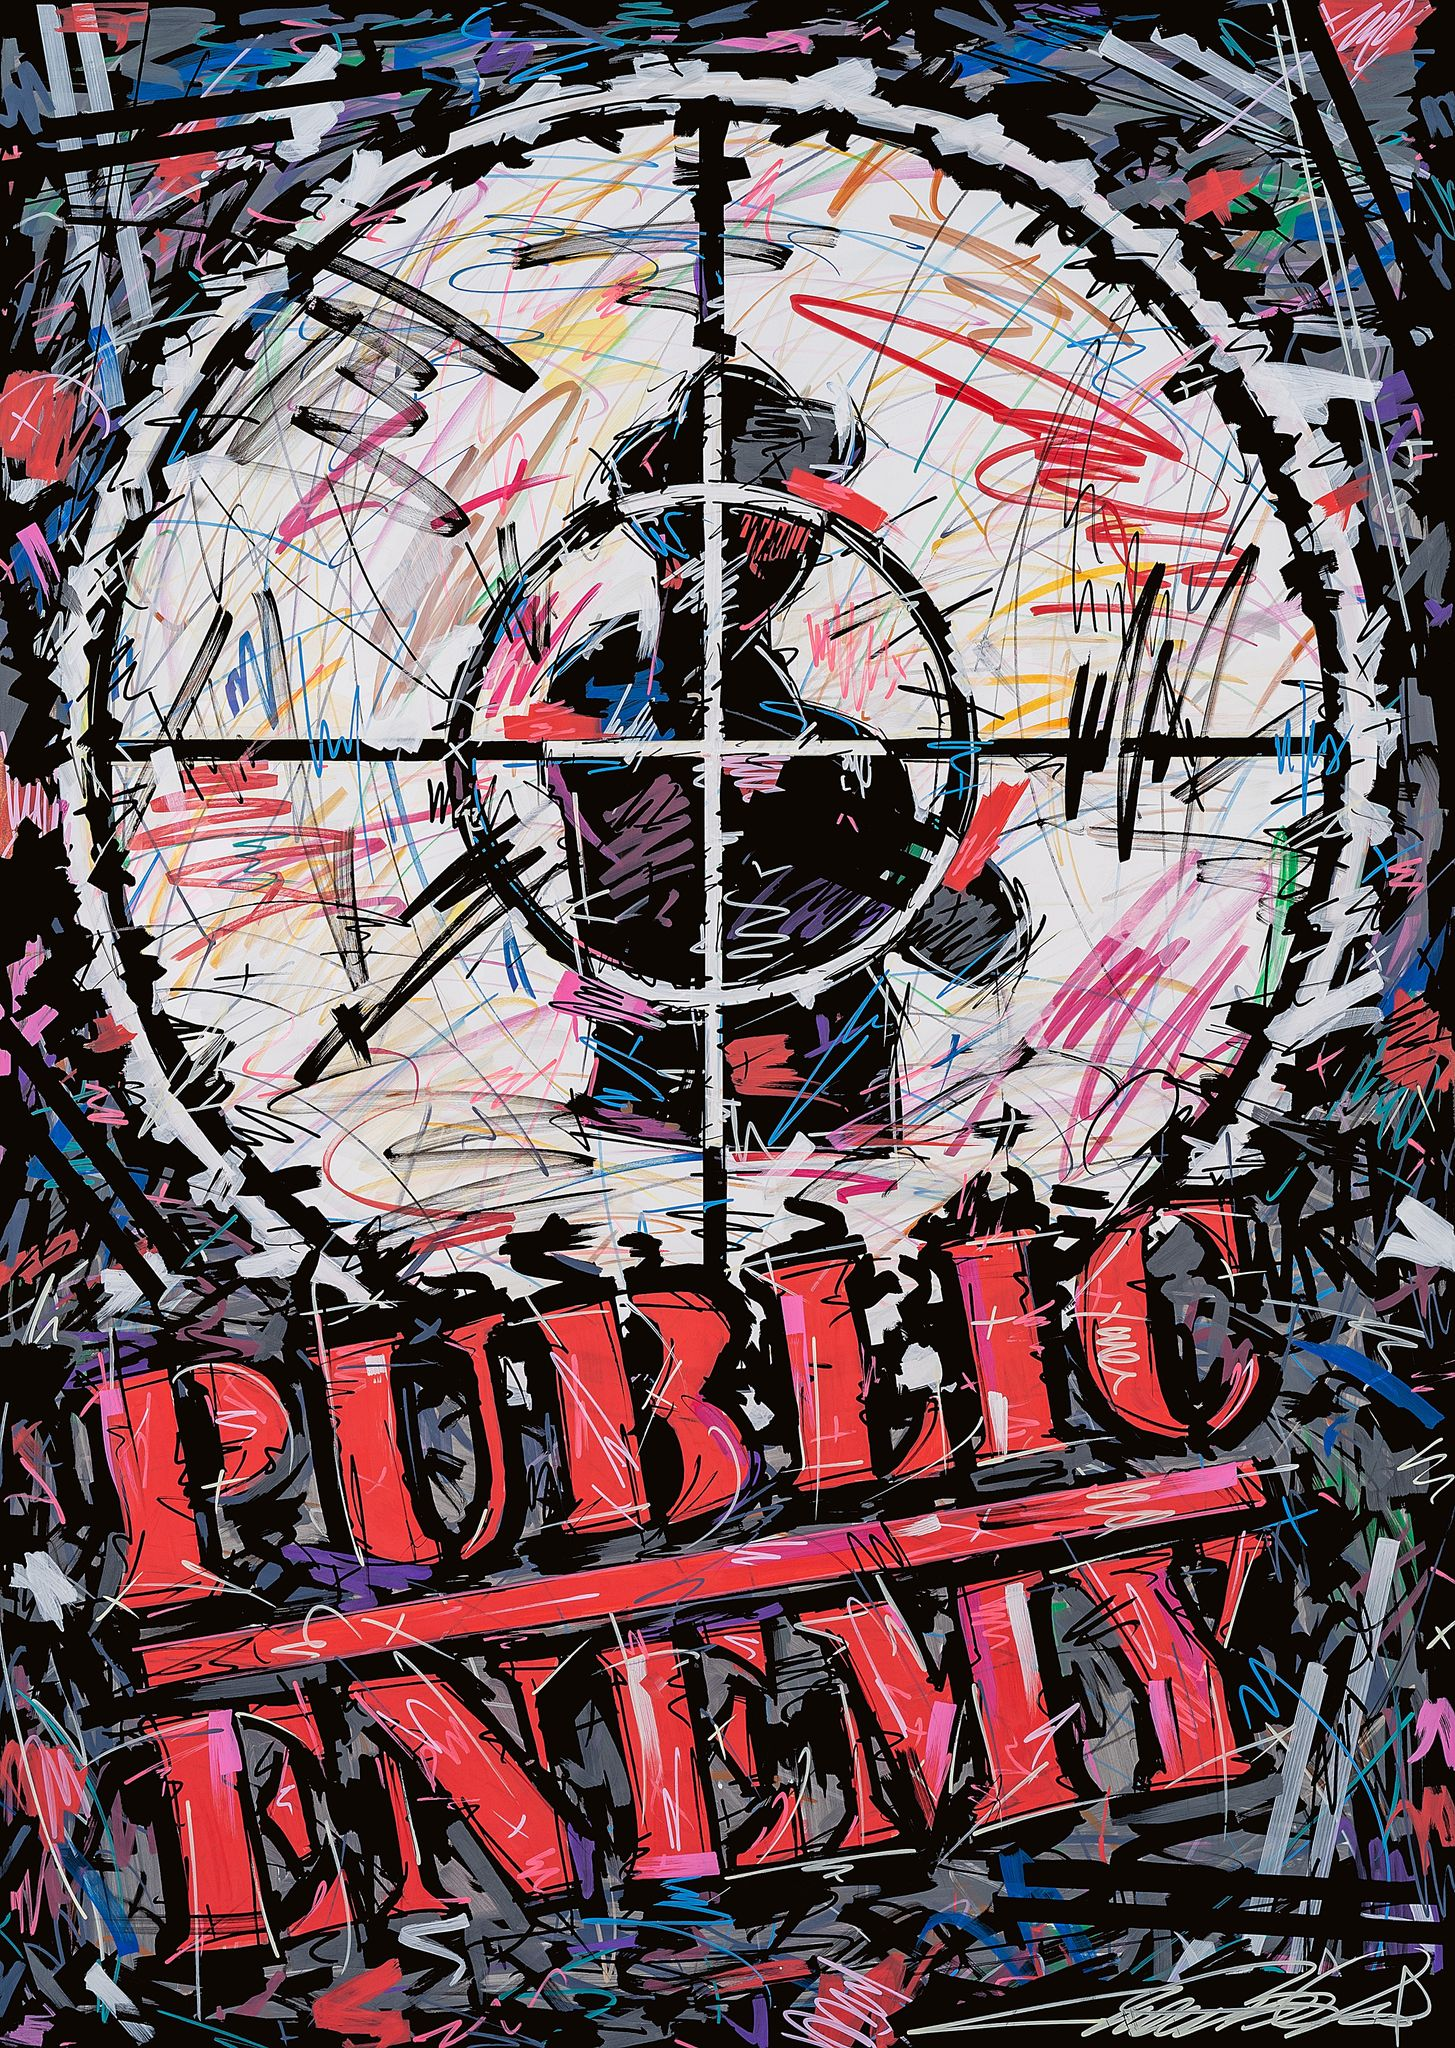 Public enemy , PE , Chuck D , Flavor Flav , Dj Lord , Hip hop art , Ivan Beslic , artisbullshit , ivan beslic art , Marker art